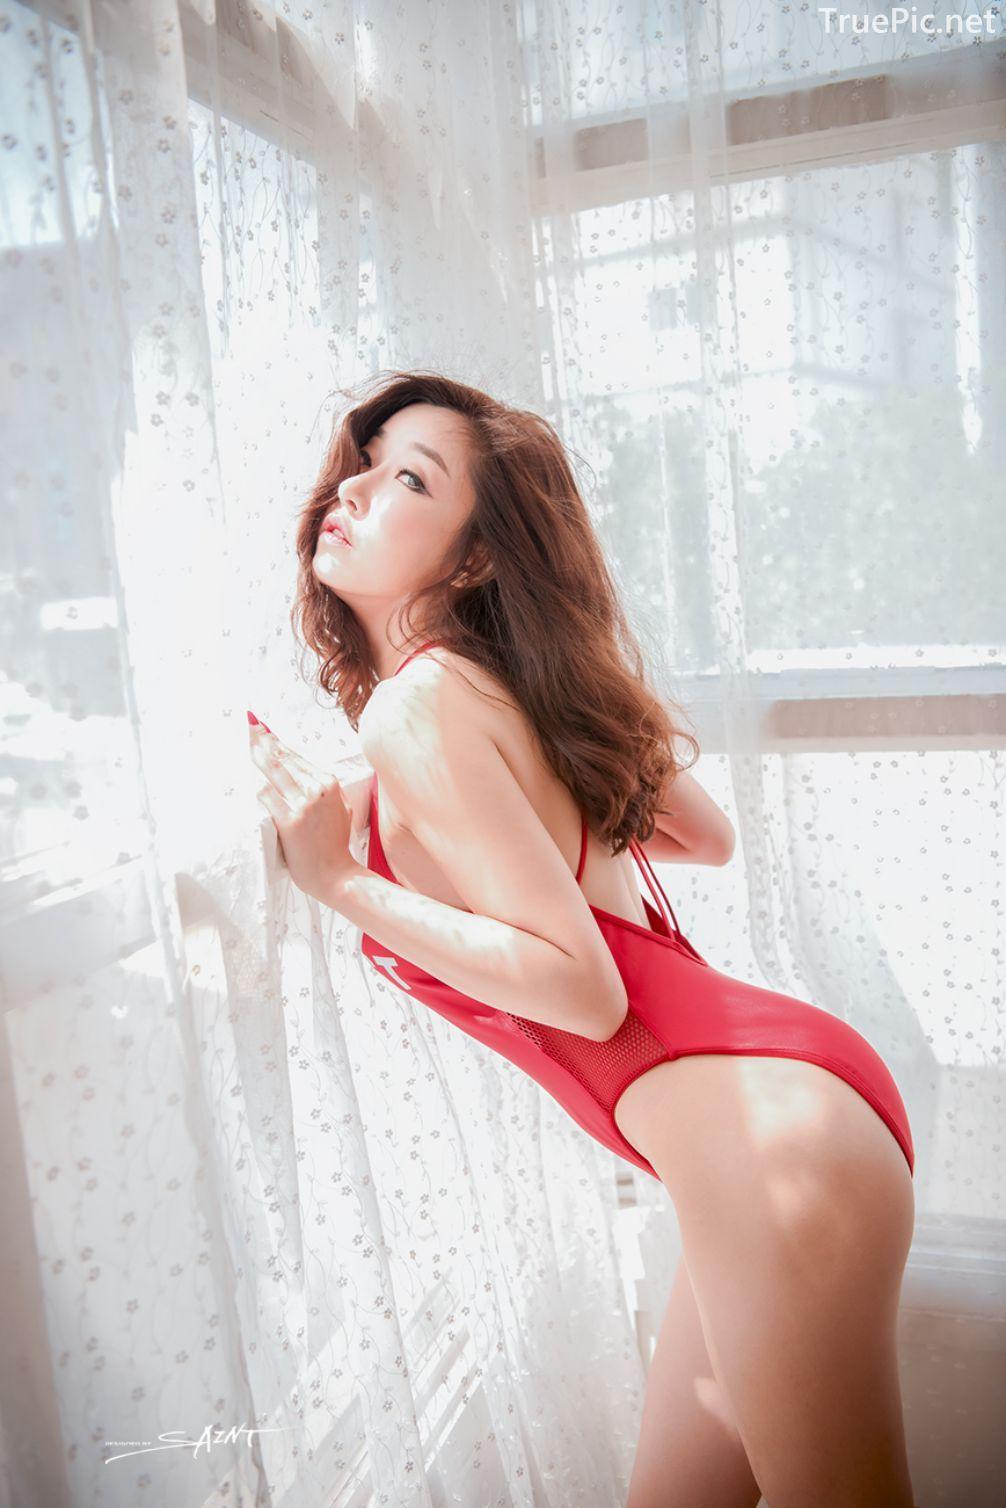 Korean-model-Oh-Haru-Sexy-Indoor-Photoshoot-Collection-TruePic.net- Picture-4